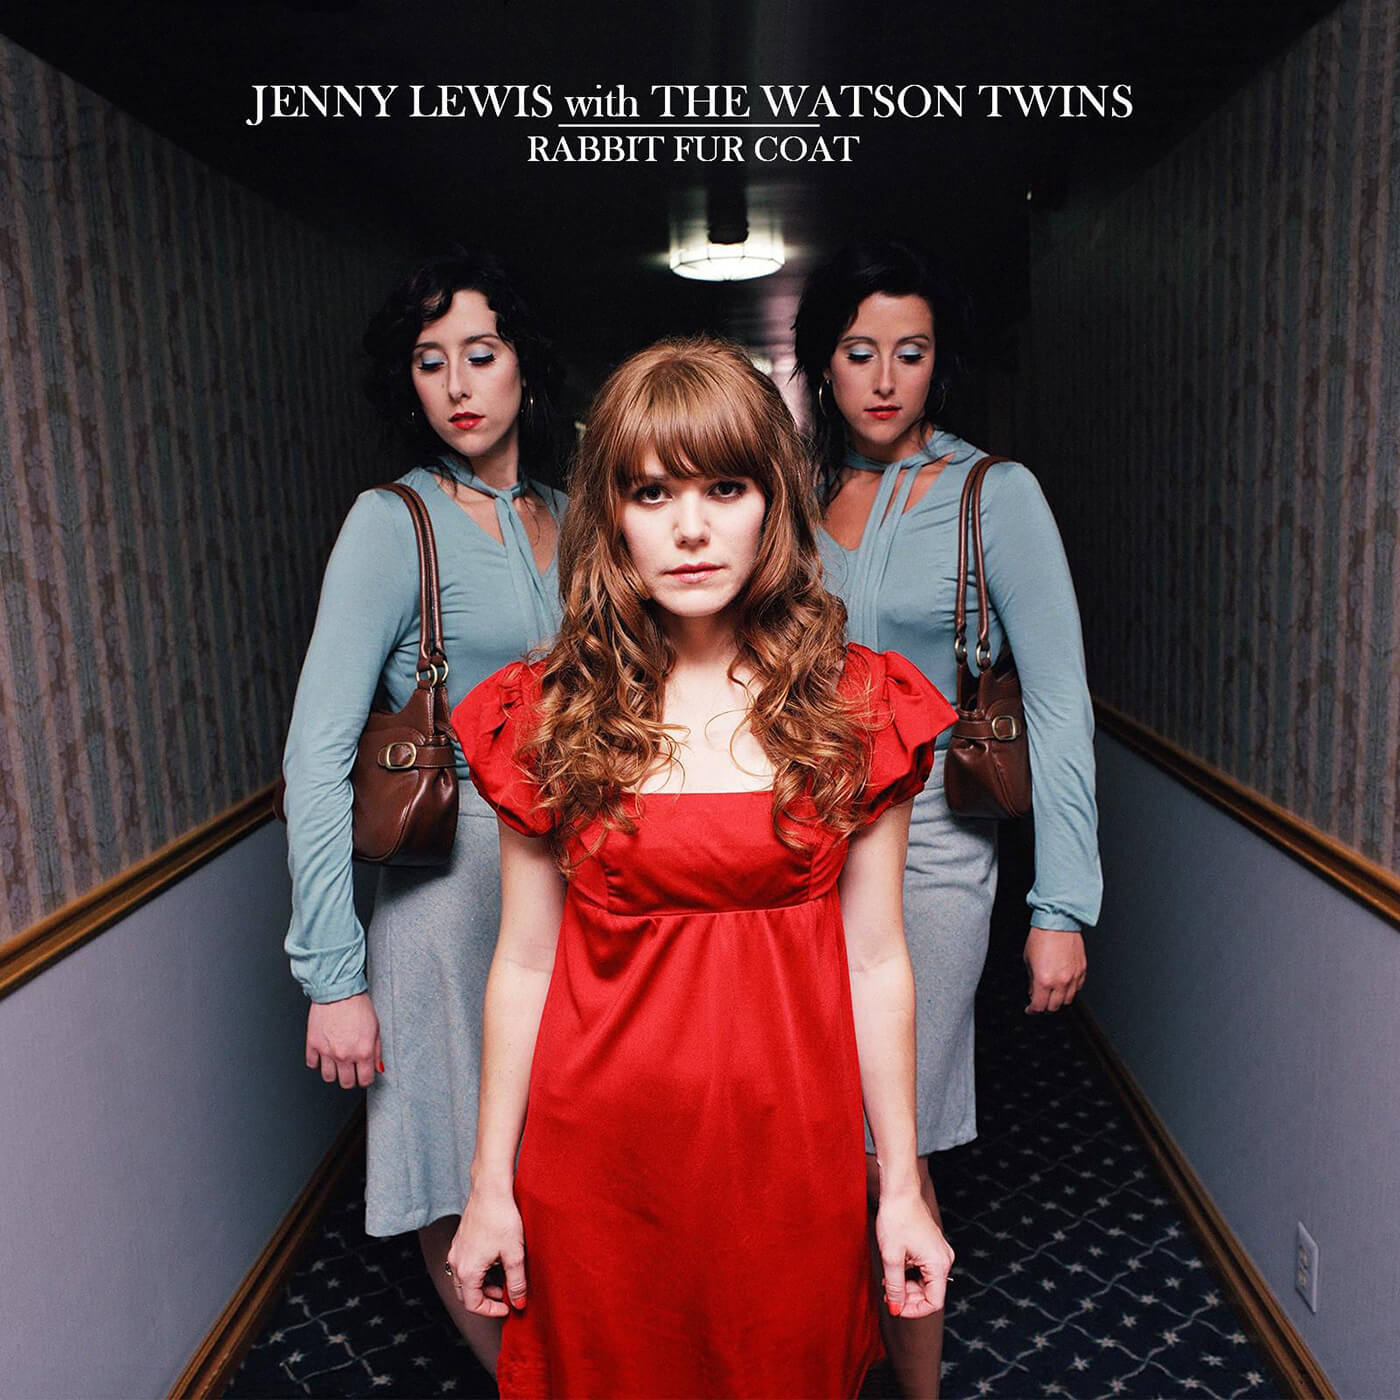 Jenny Lewis & The Watson Twins - Rabbit Fur Coat